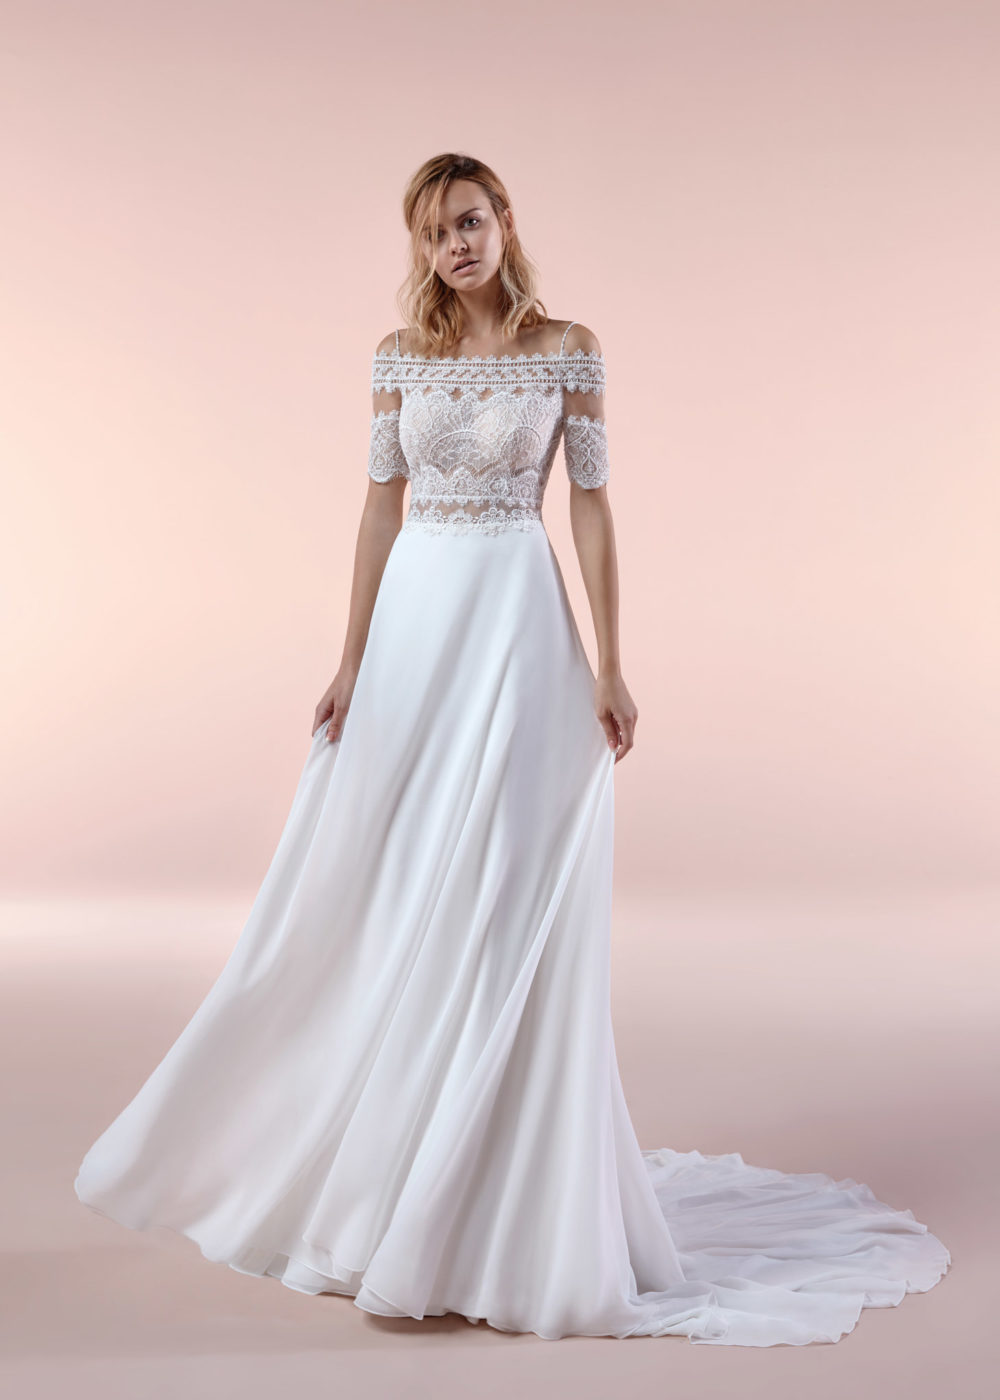 Mariages: abito da sposa Boho Chic Nicole 2020 a Vicenza, Verona, Padova, Veneto BCA20091